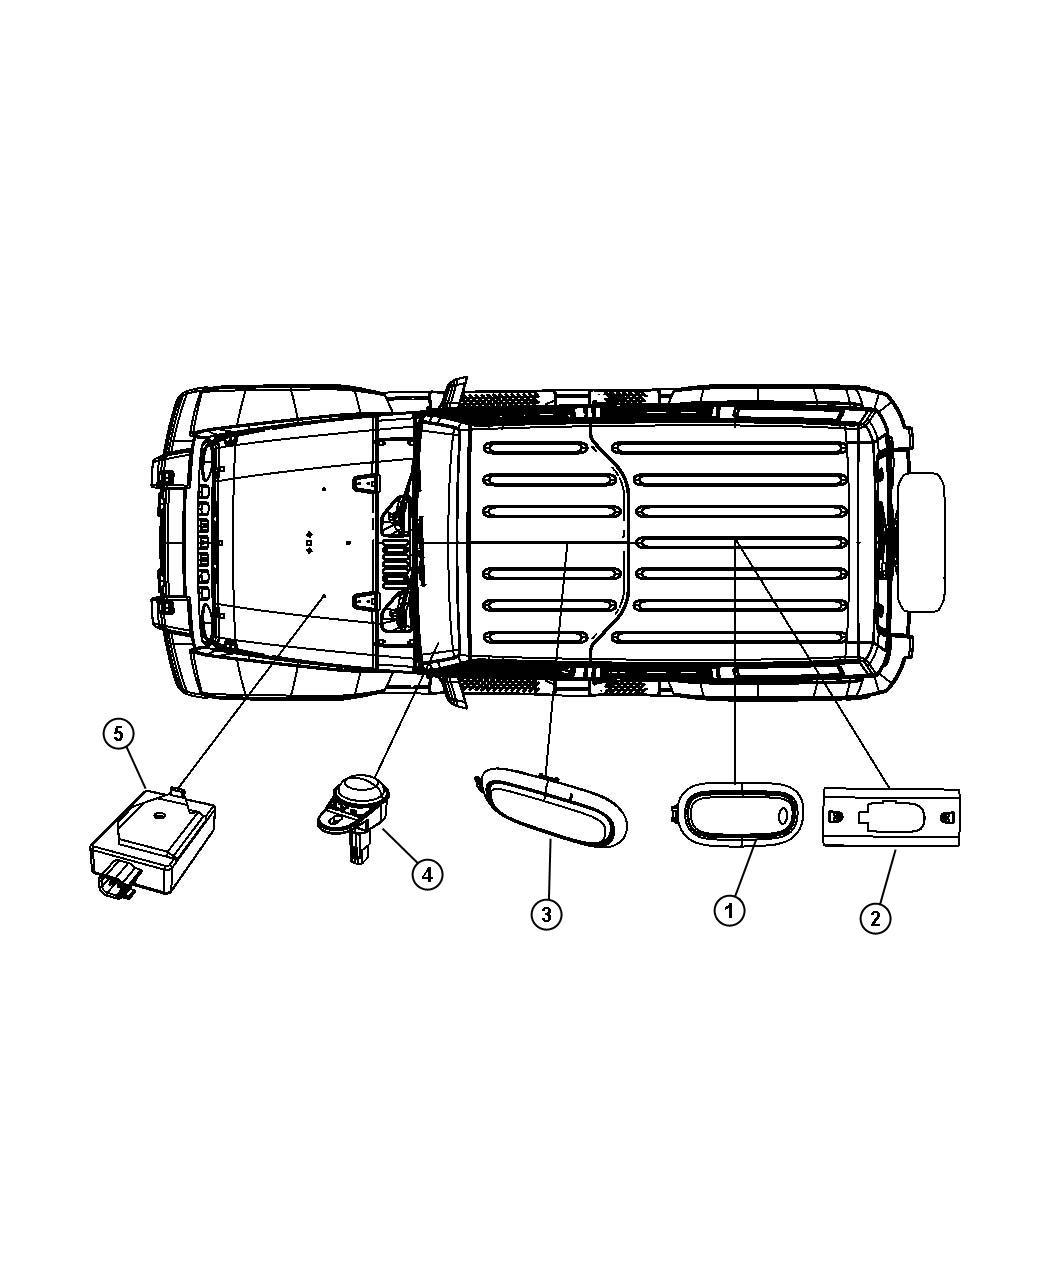 Jeep Wrangler Lamp Dome Trim All Trim Codes